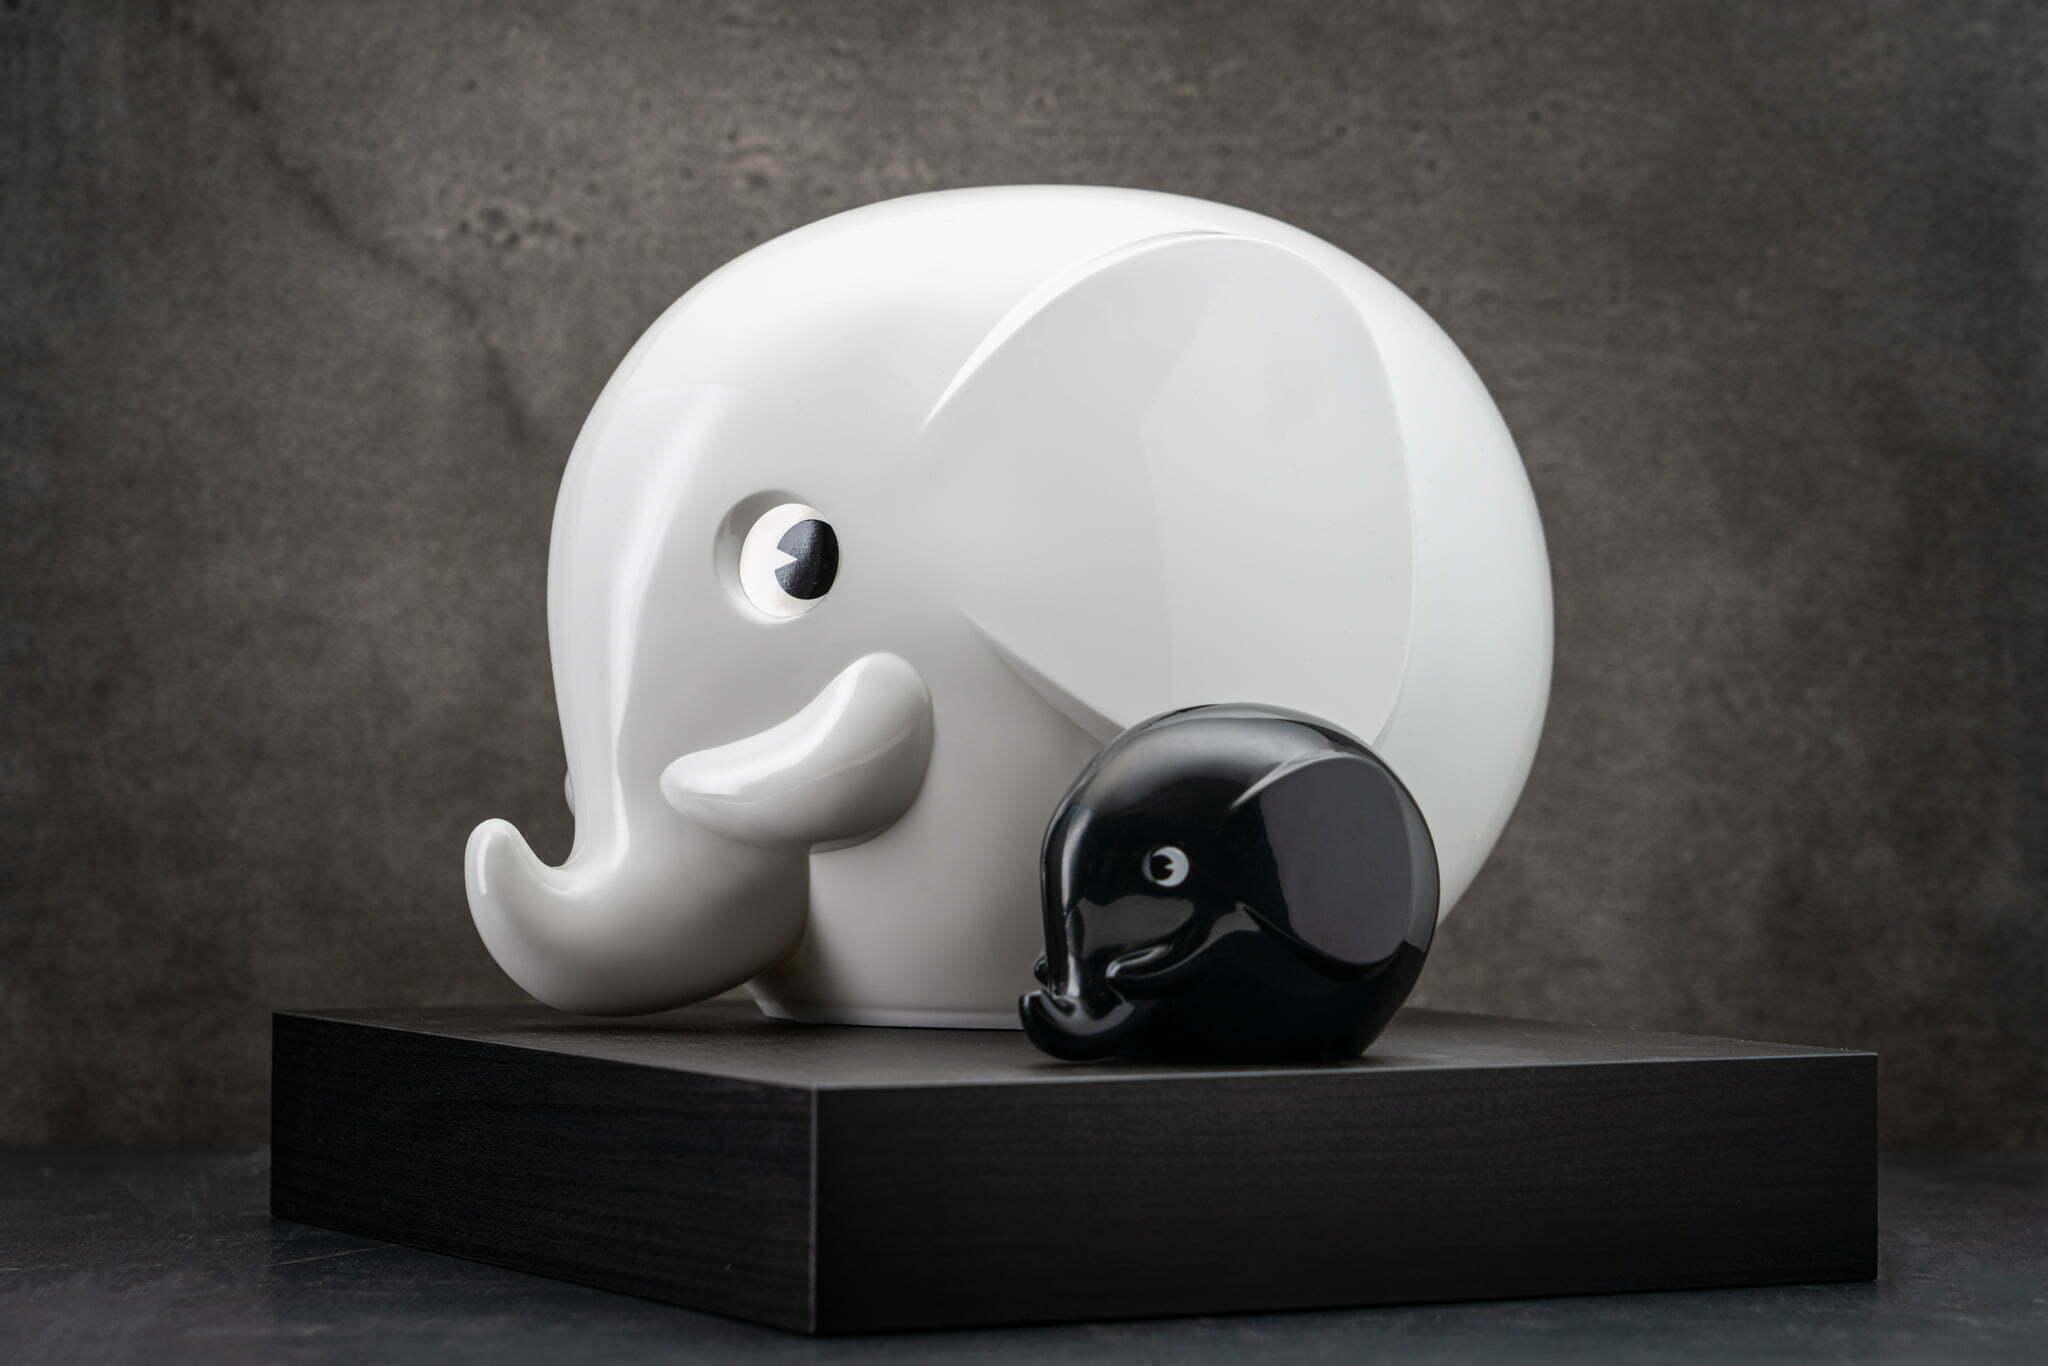 Iso ja pieni norsu 092019_lowres